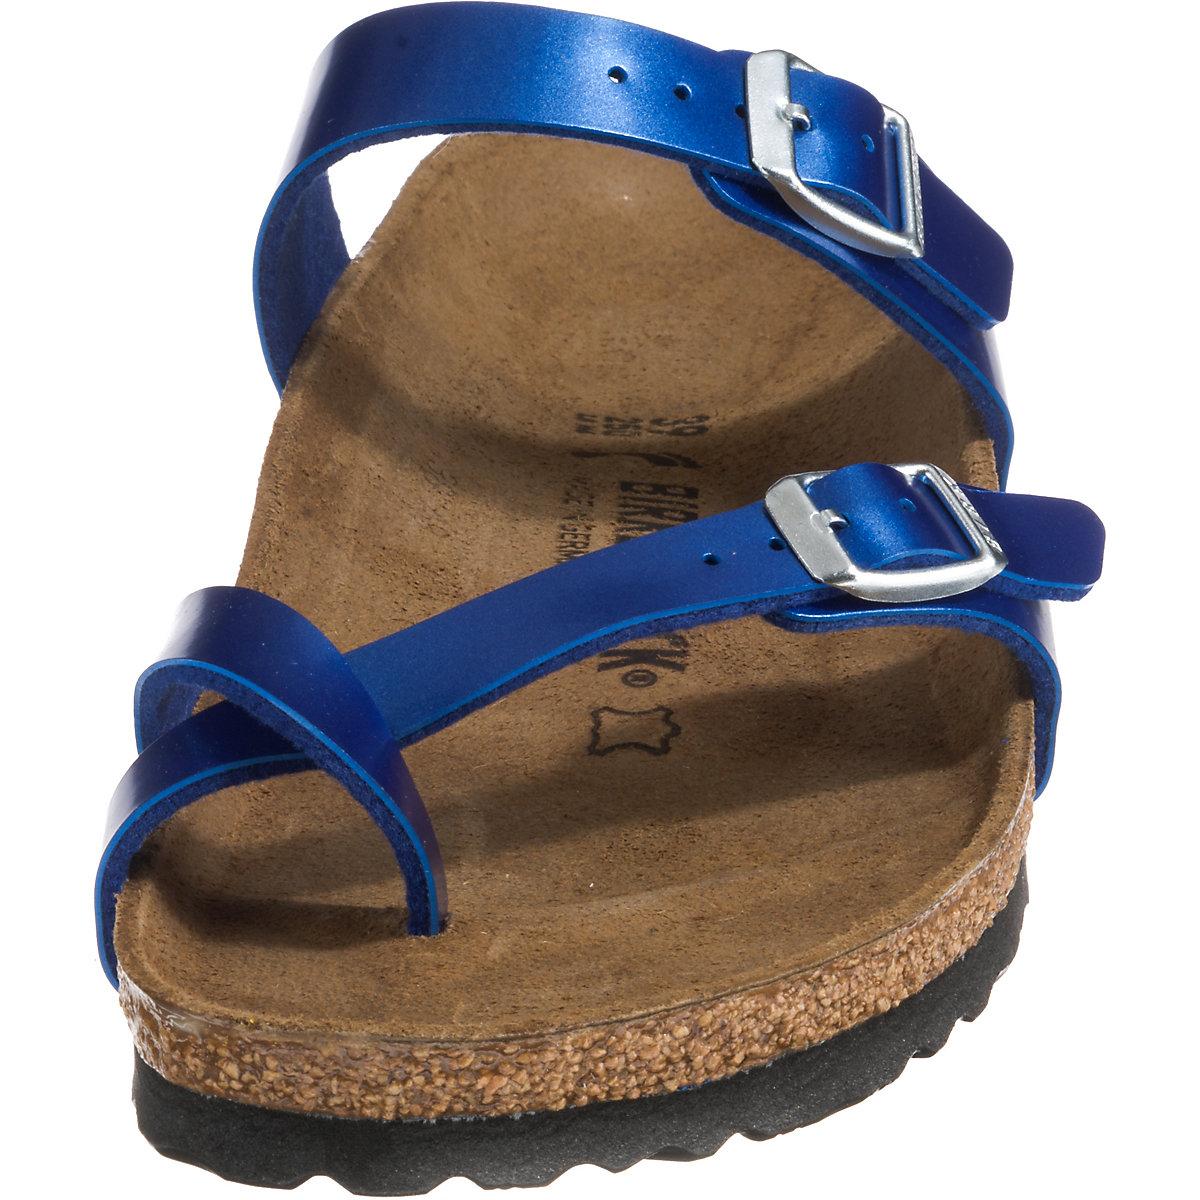 Birkenstock, Mayari Pantoletten, Blau Artikelnummer:10635471